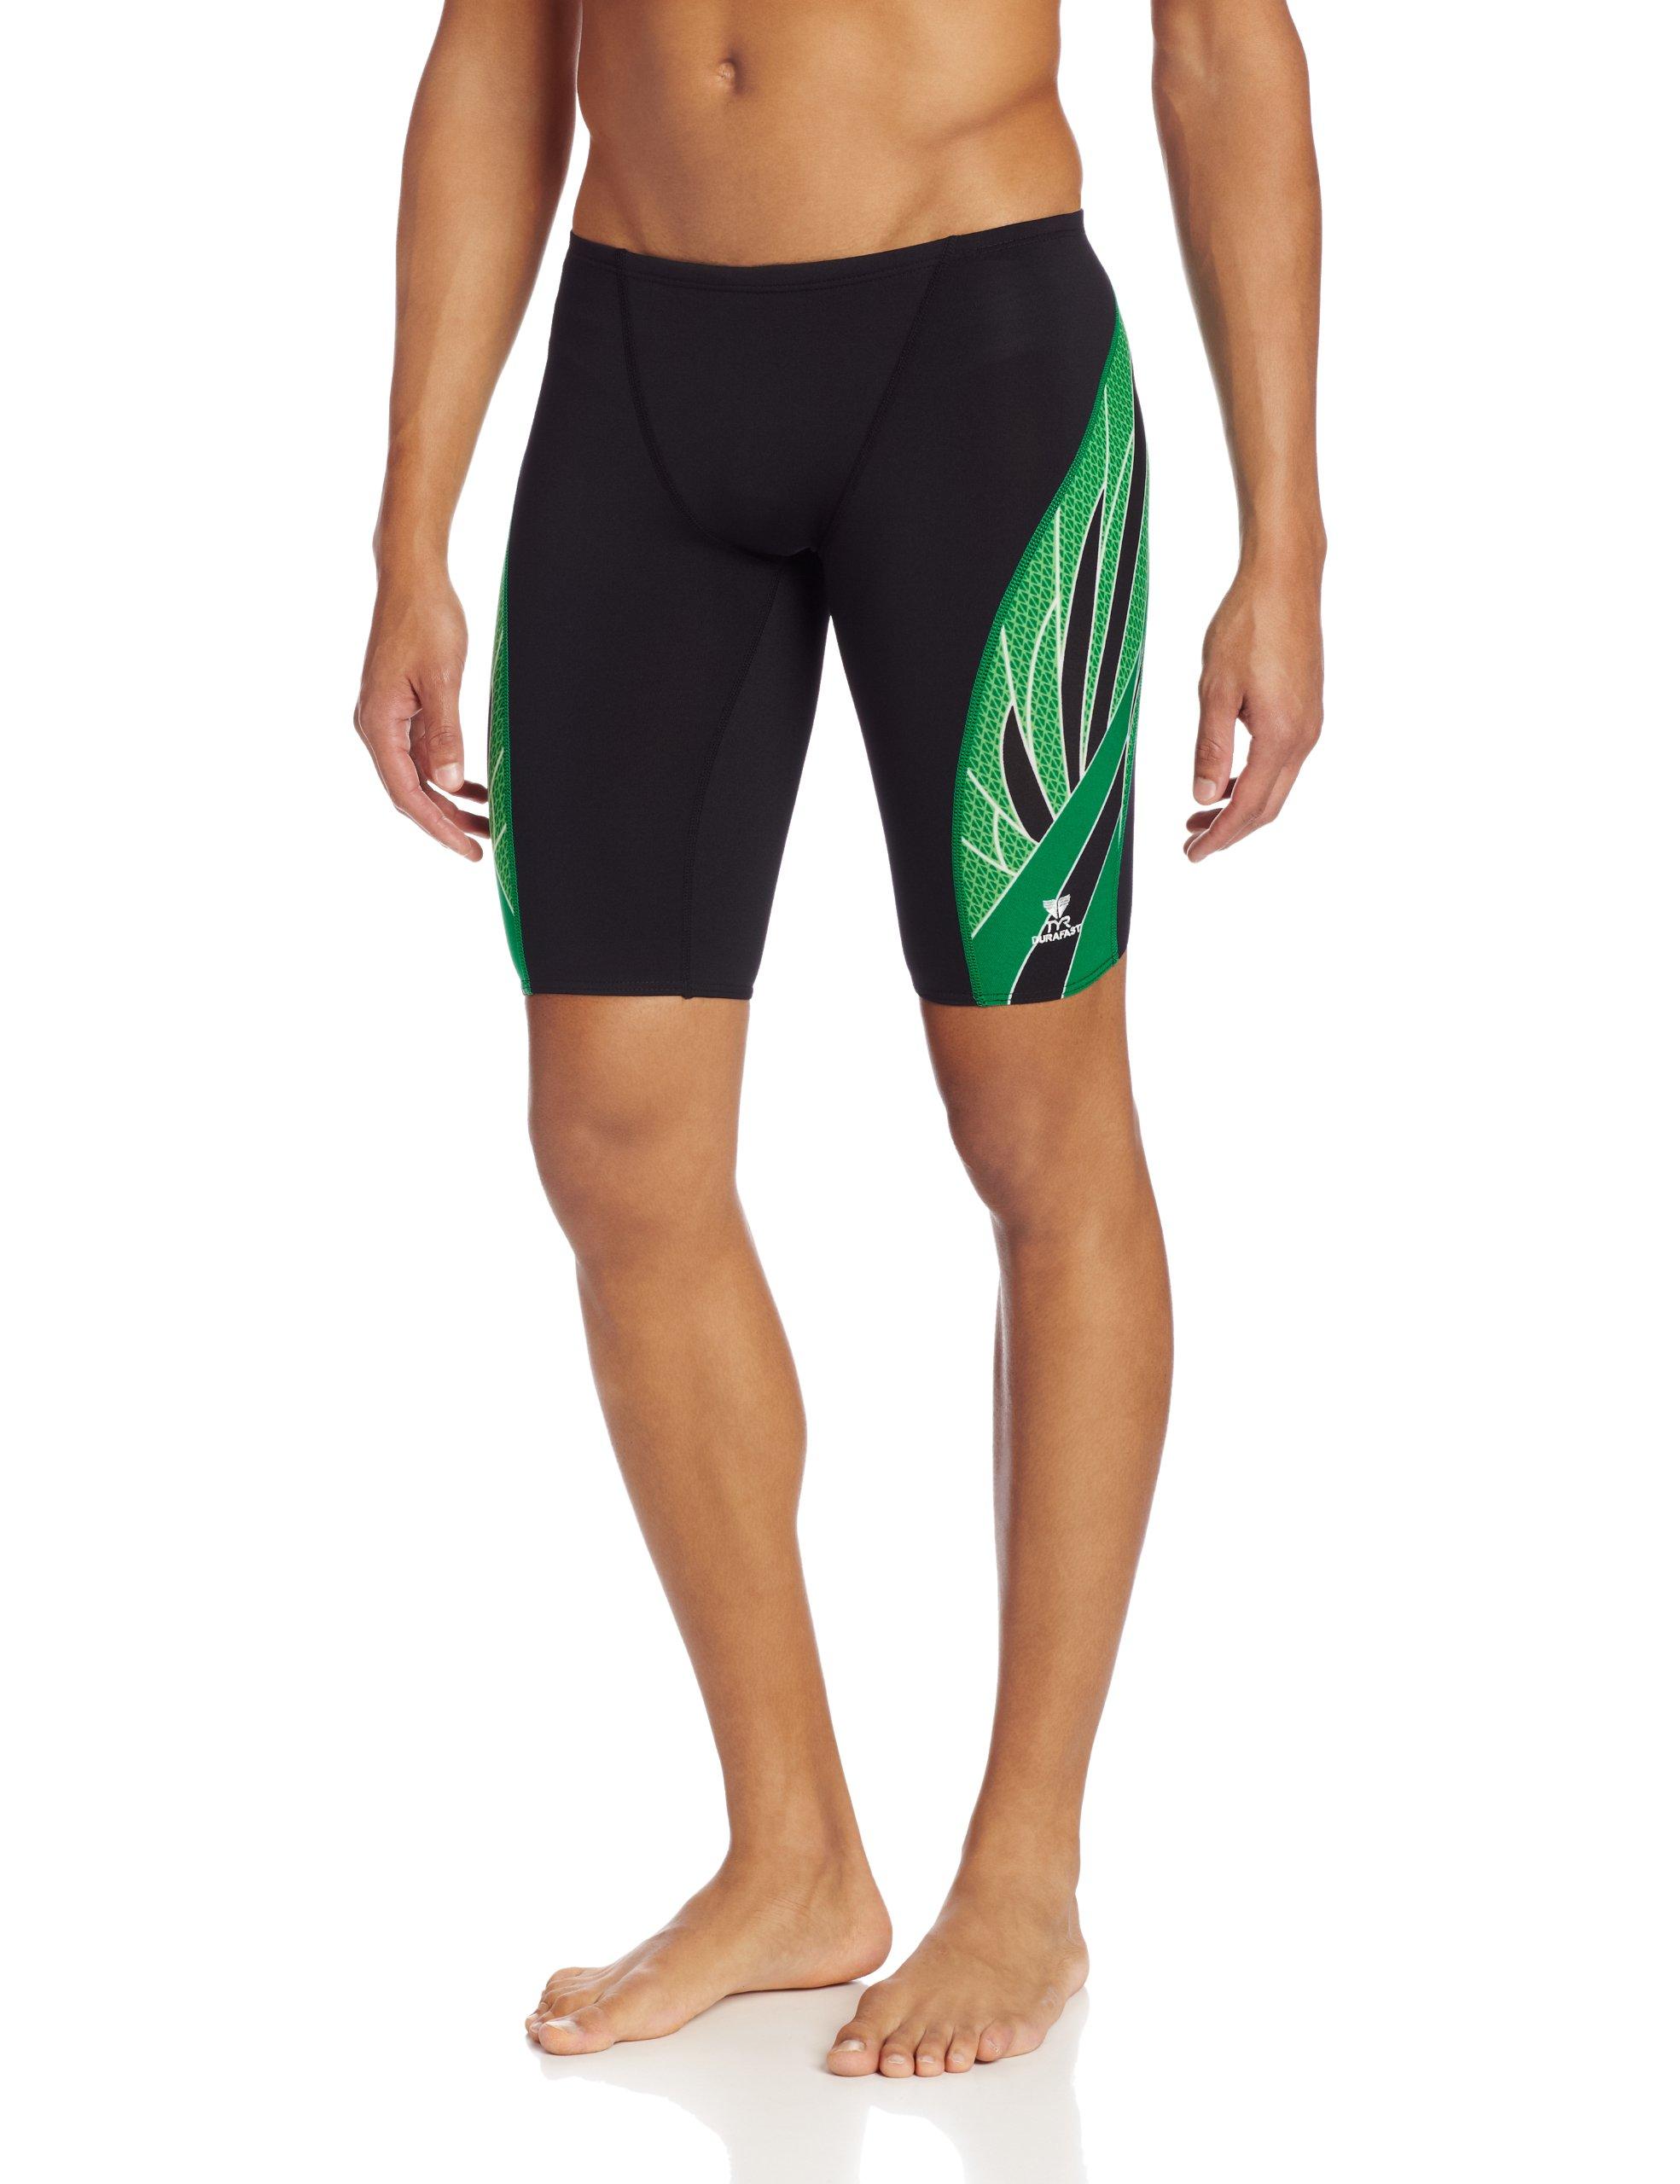 efbf9205be0e7 Best Rated in Men s Athletic Swimwear   Helpful Customer Reviews ...